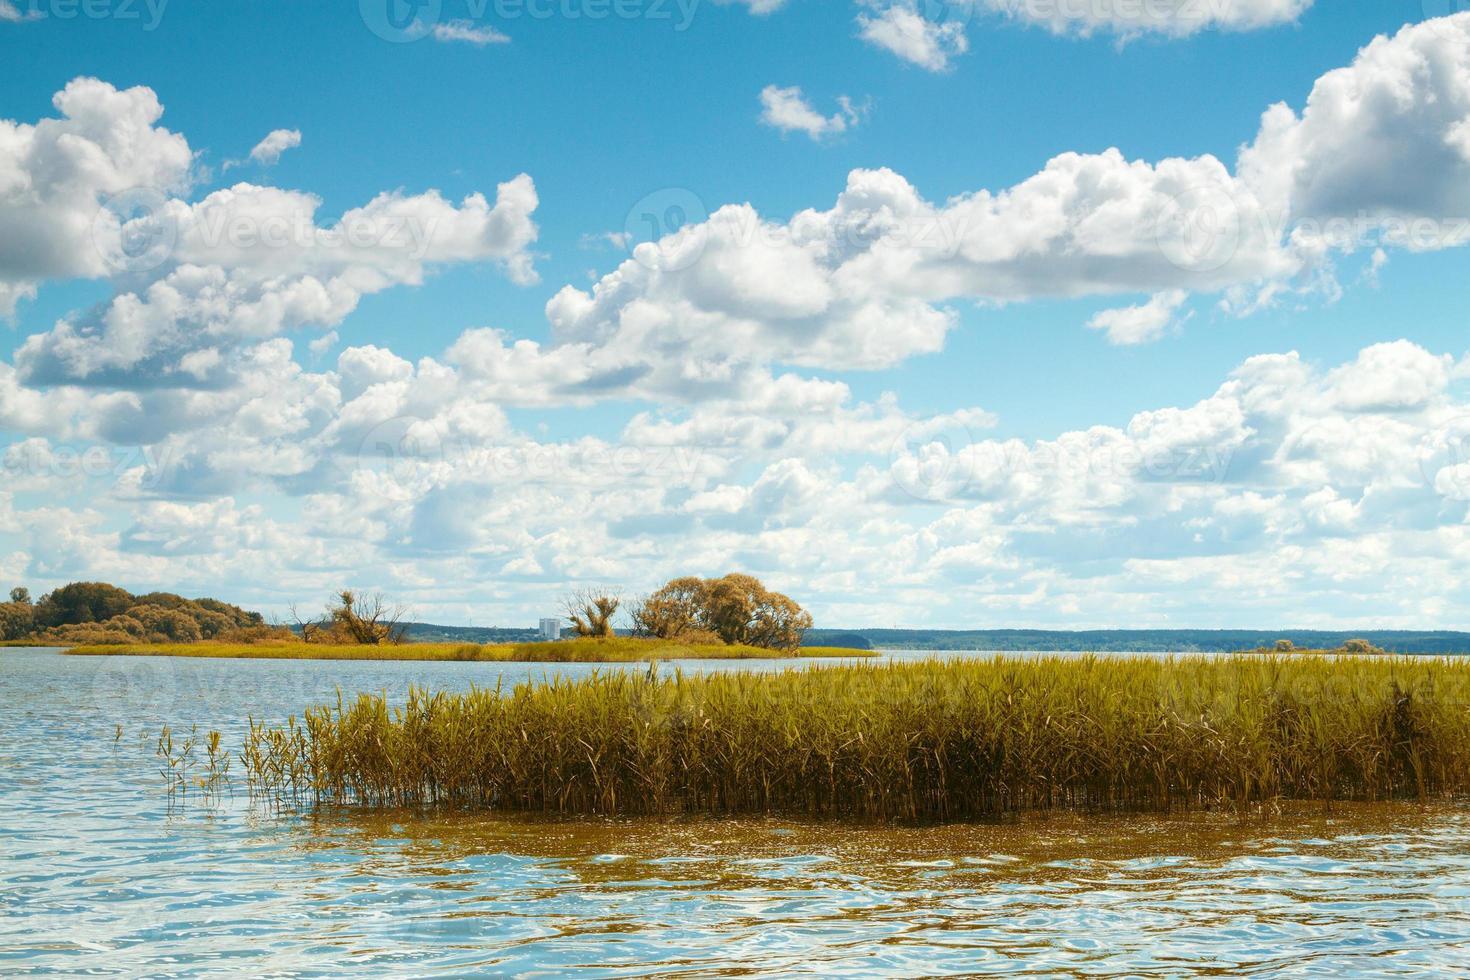 lago de los bosques foto